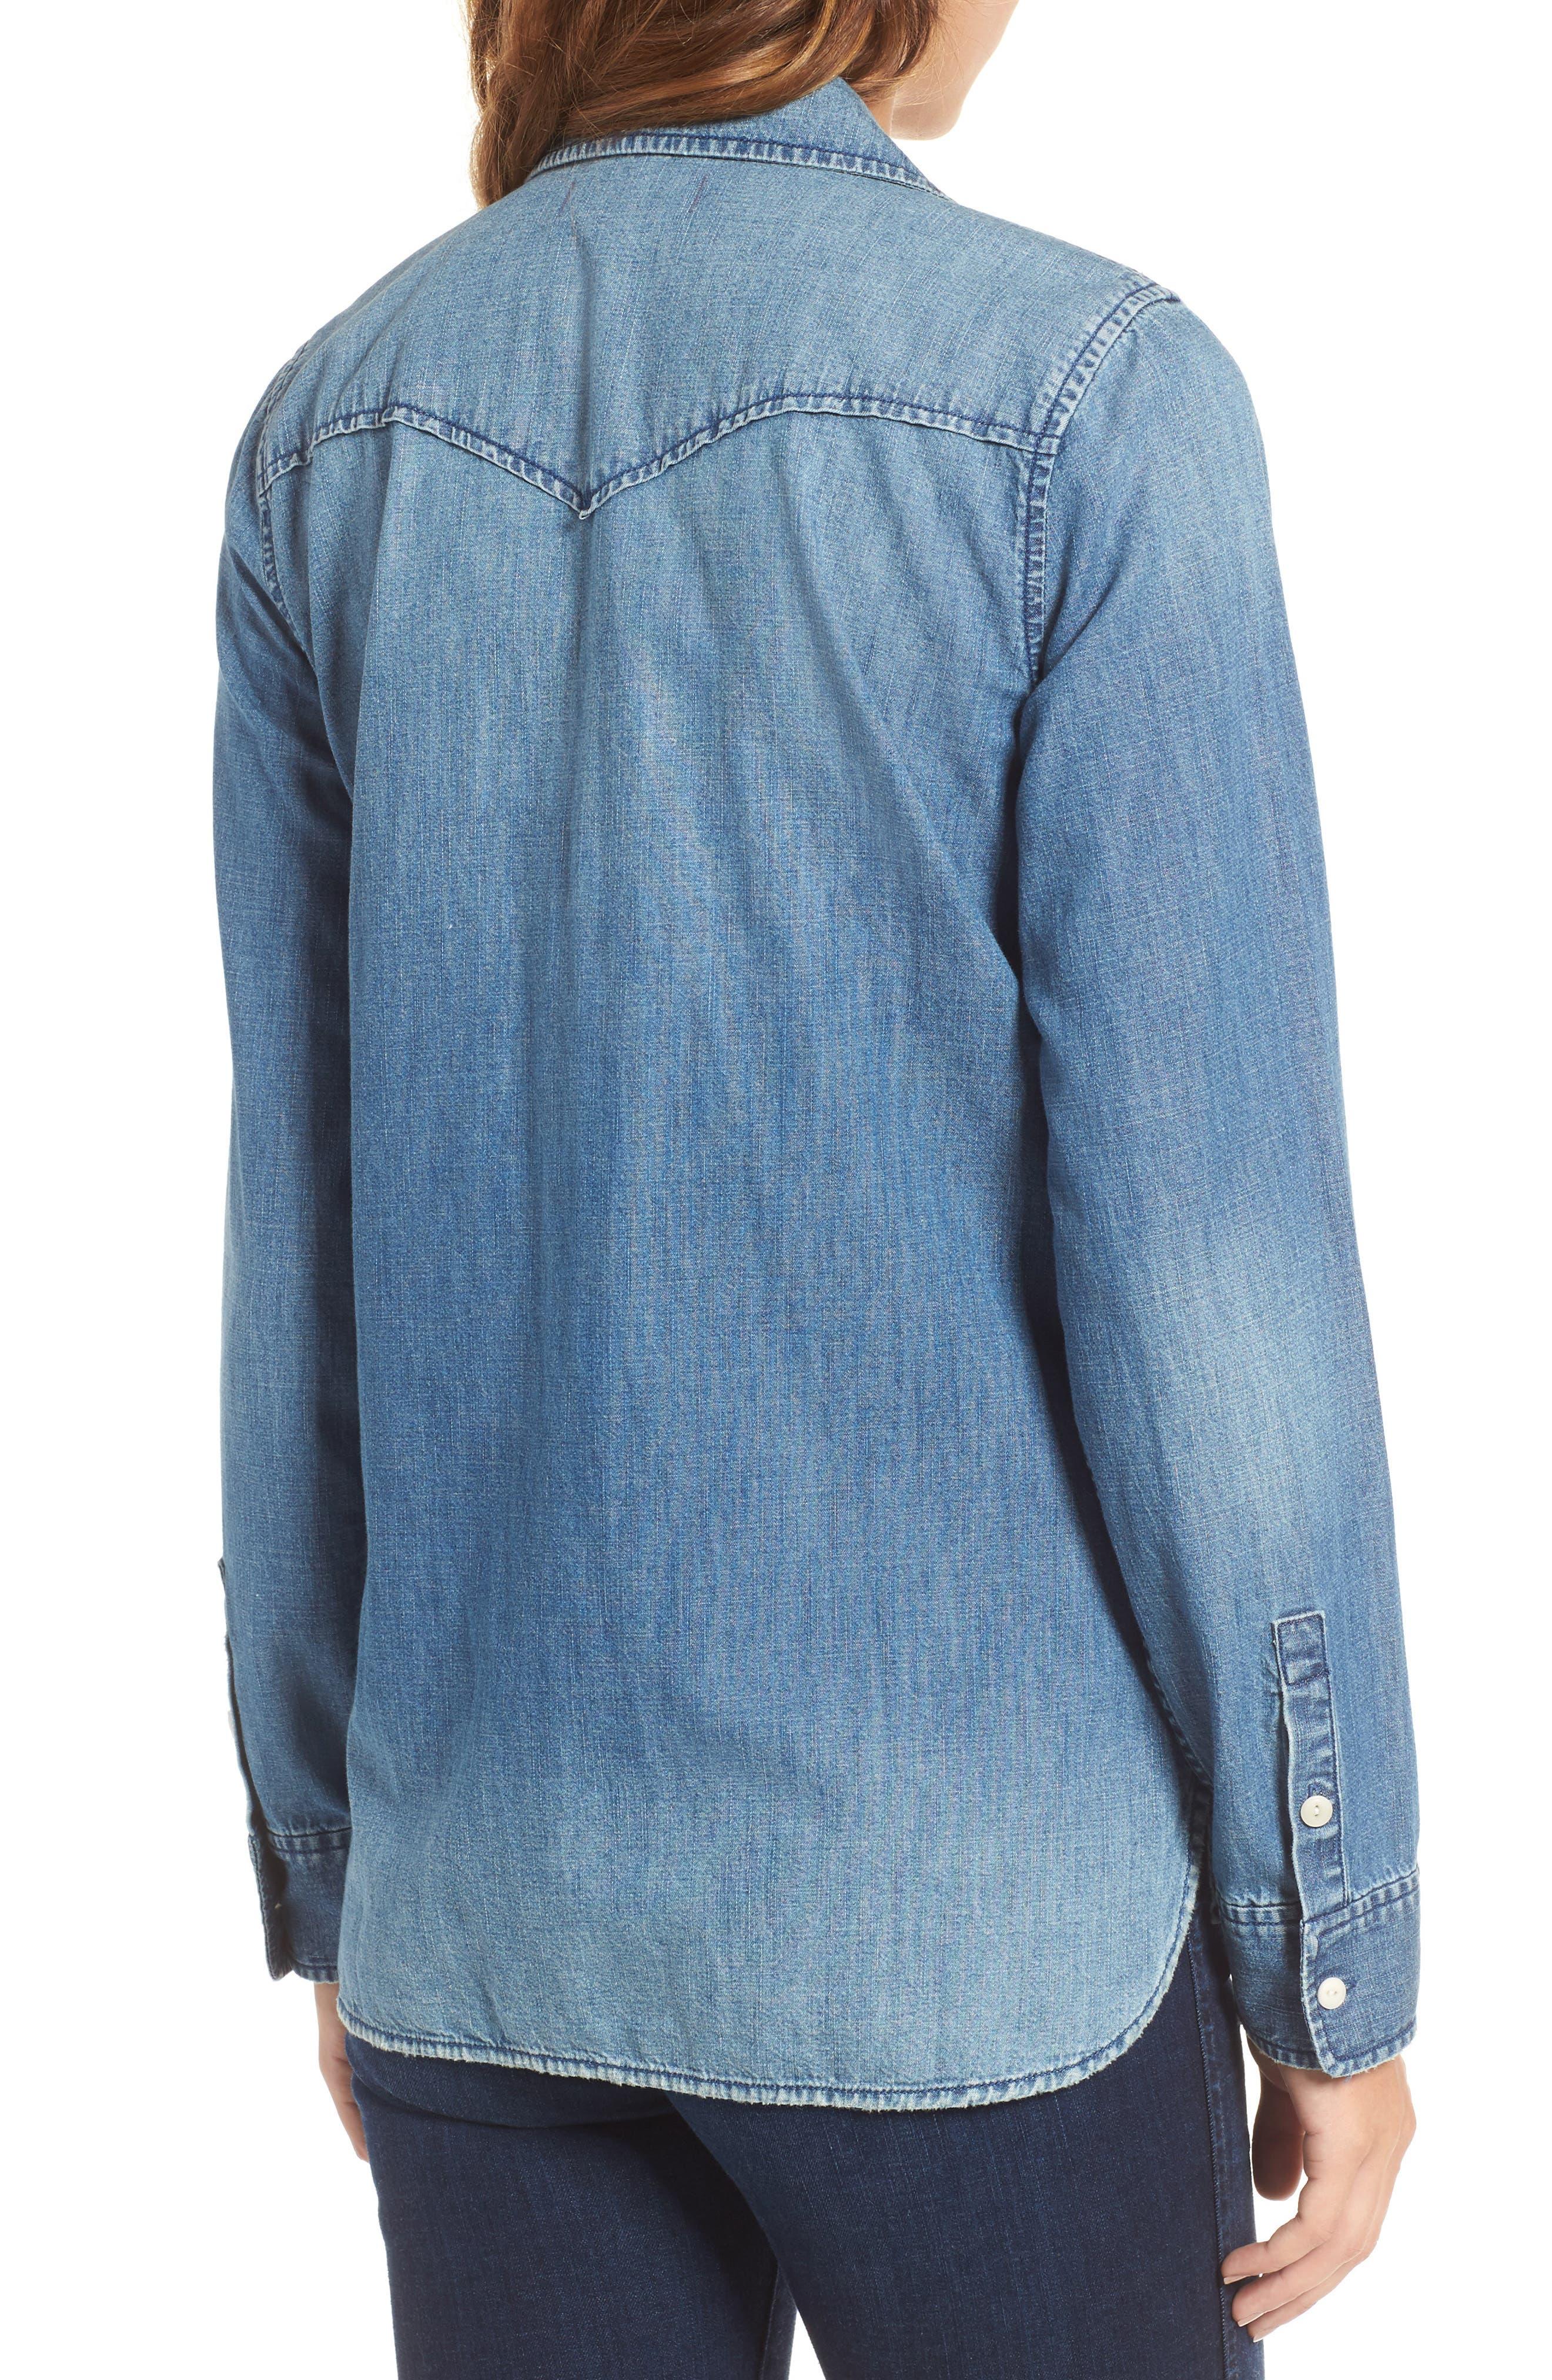 Alternate Image 2  - Madewell Lace-Up Denim Shirt